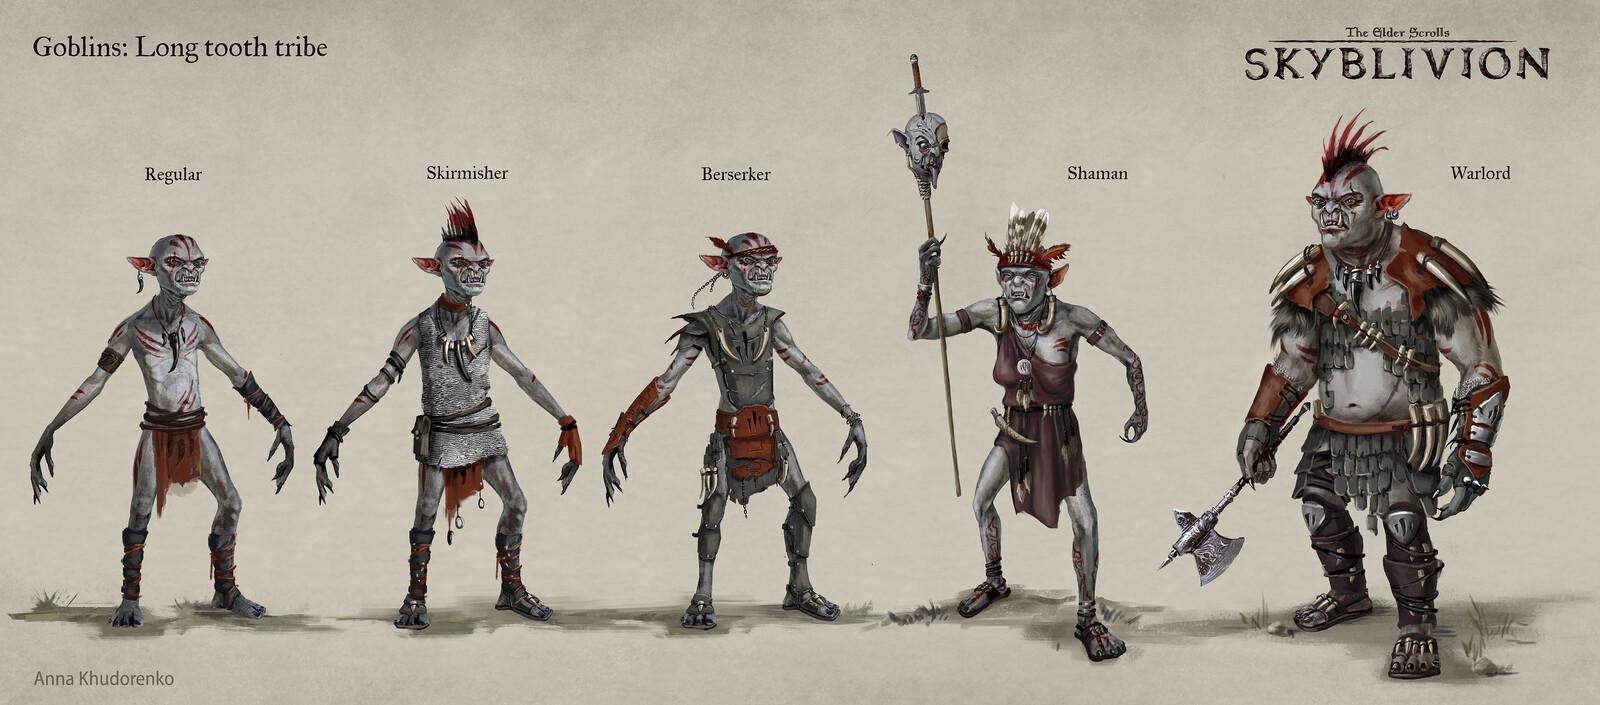 Skyblivion: Goblin tribes